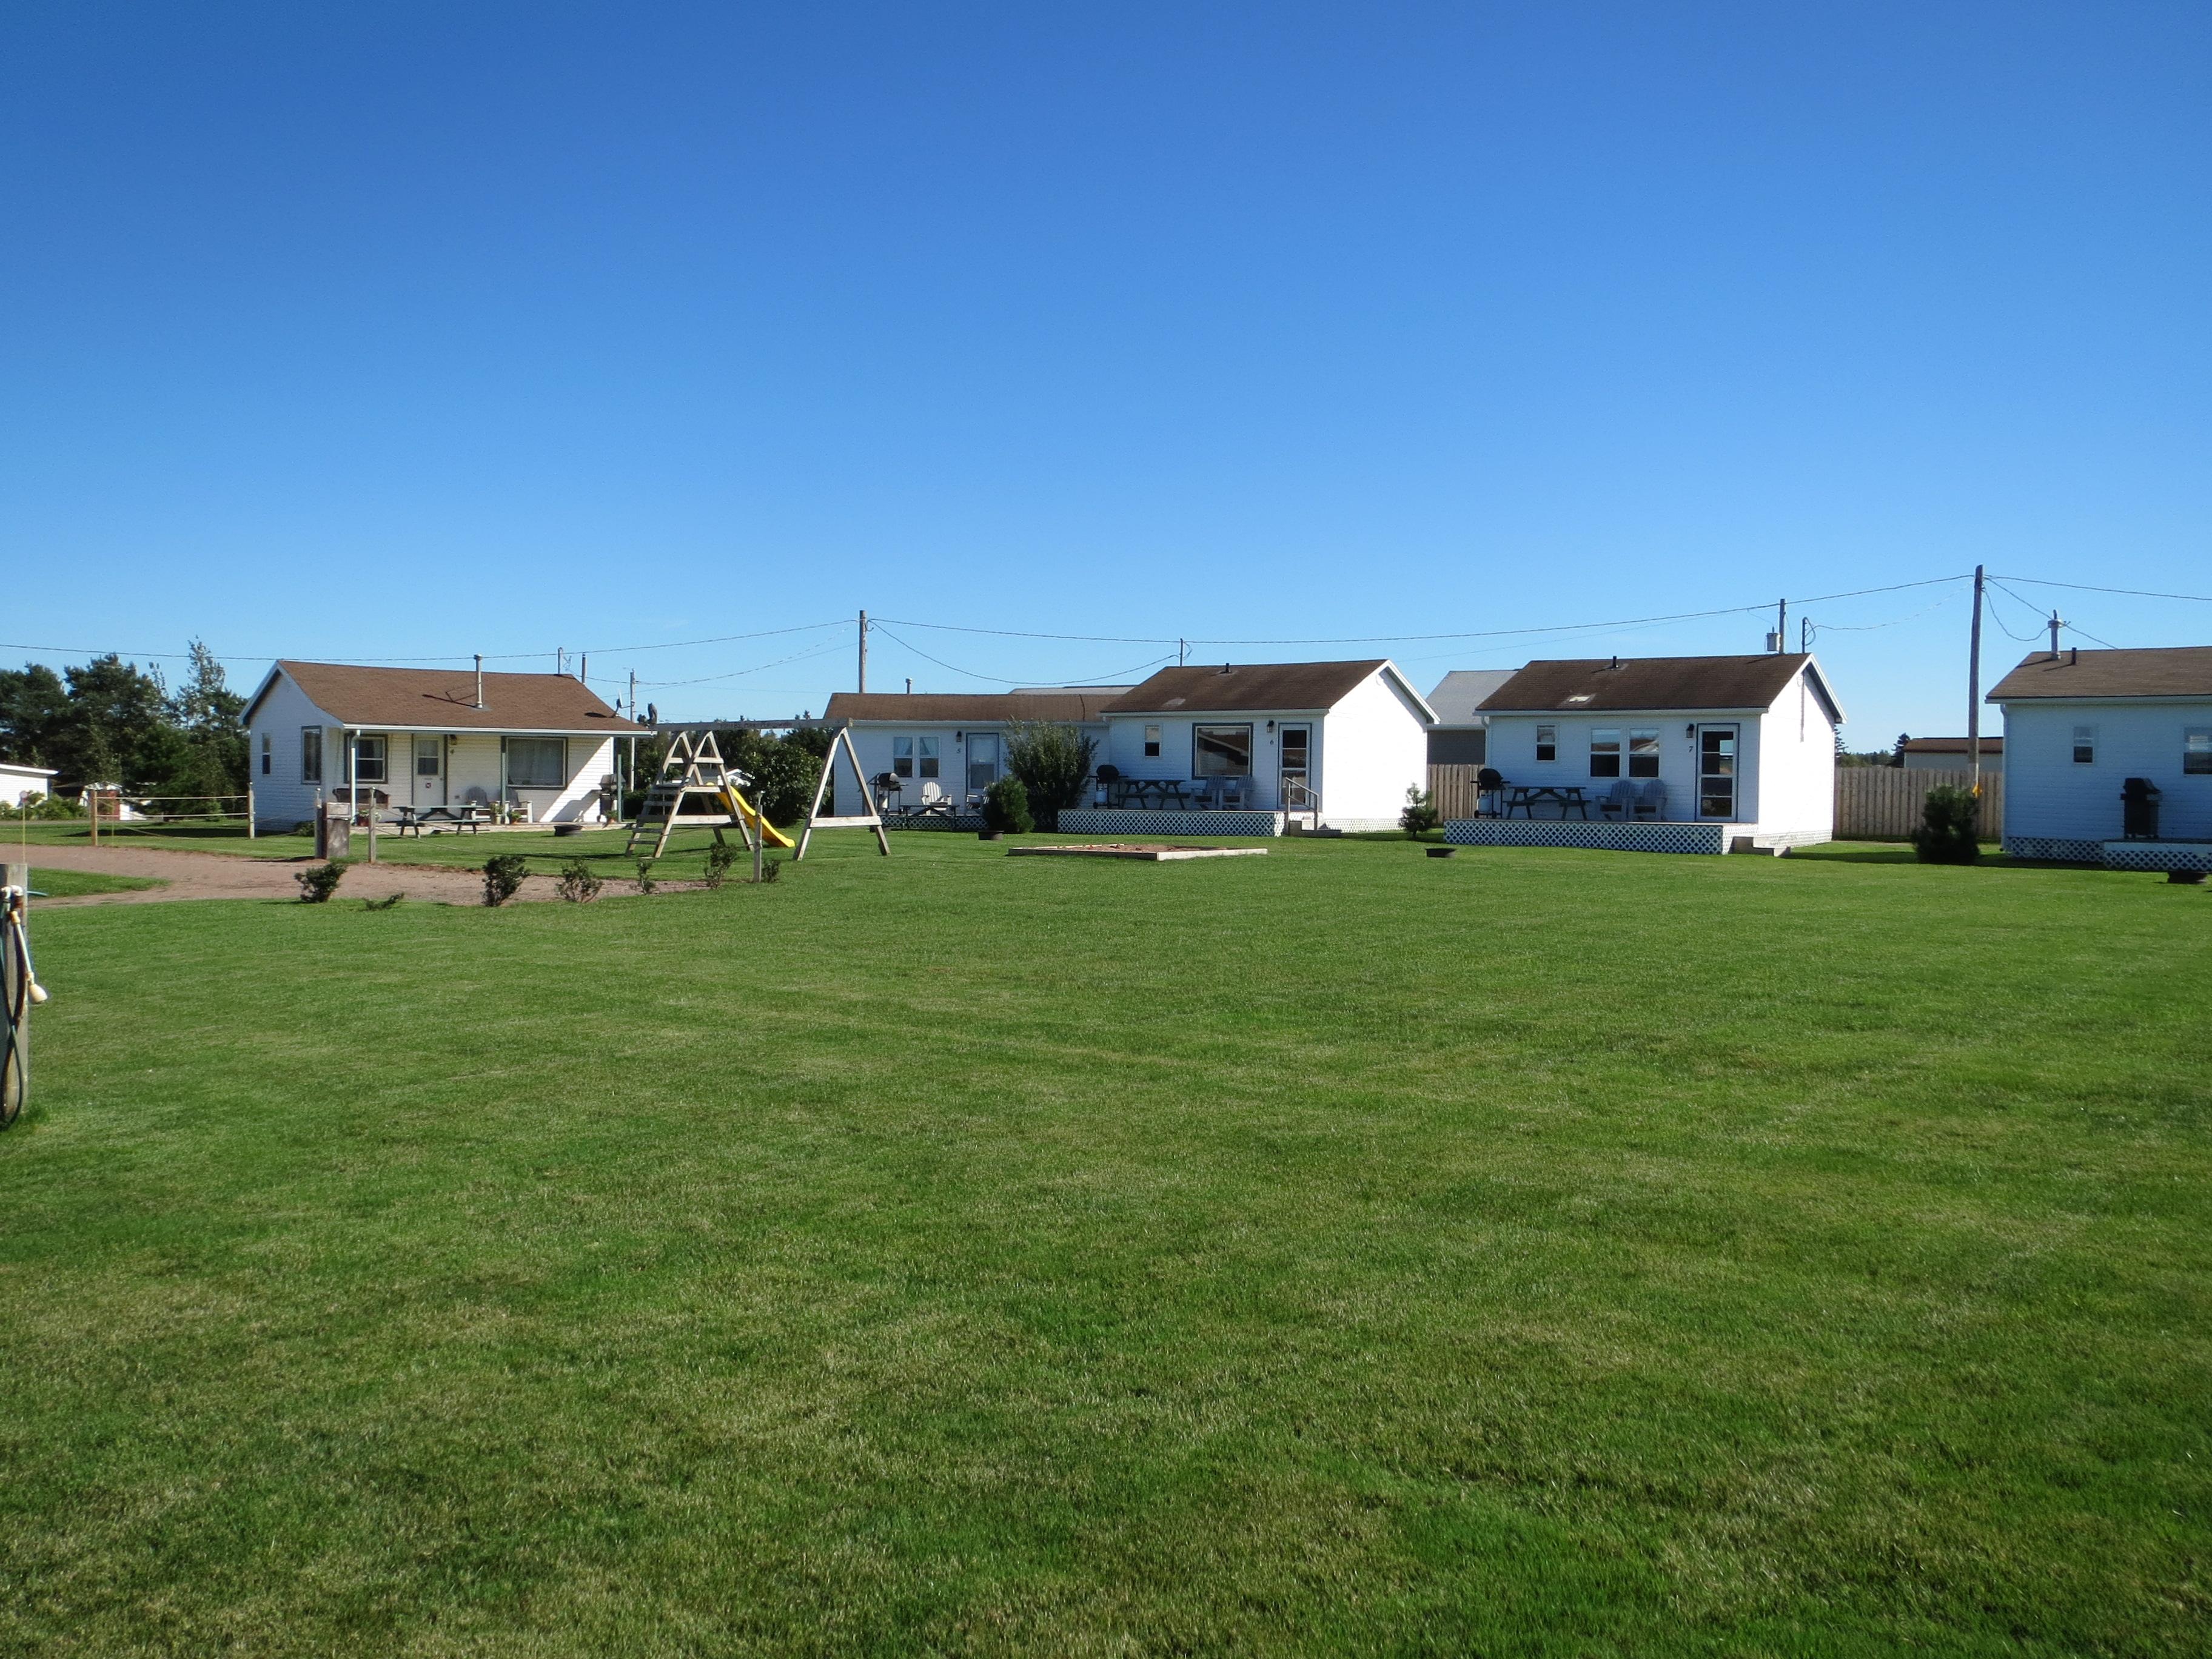 pei cottages pei cottage rentals pei cottages for rent waterfront rh schurmansshorecottages com